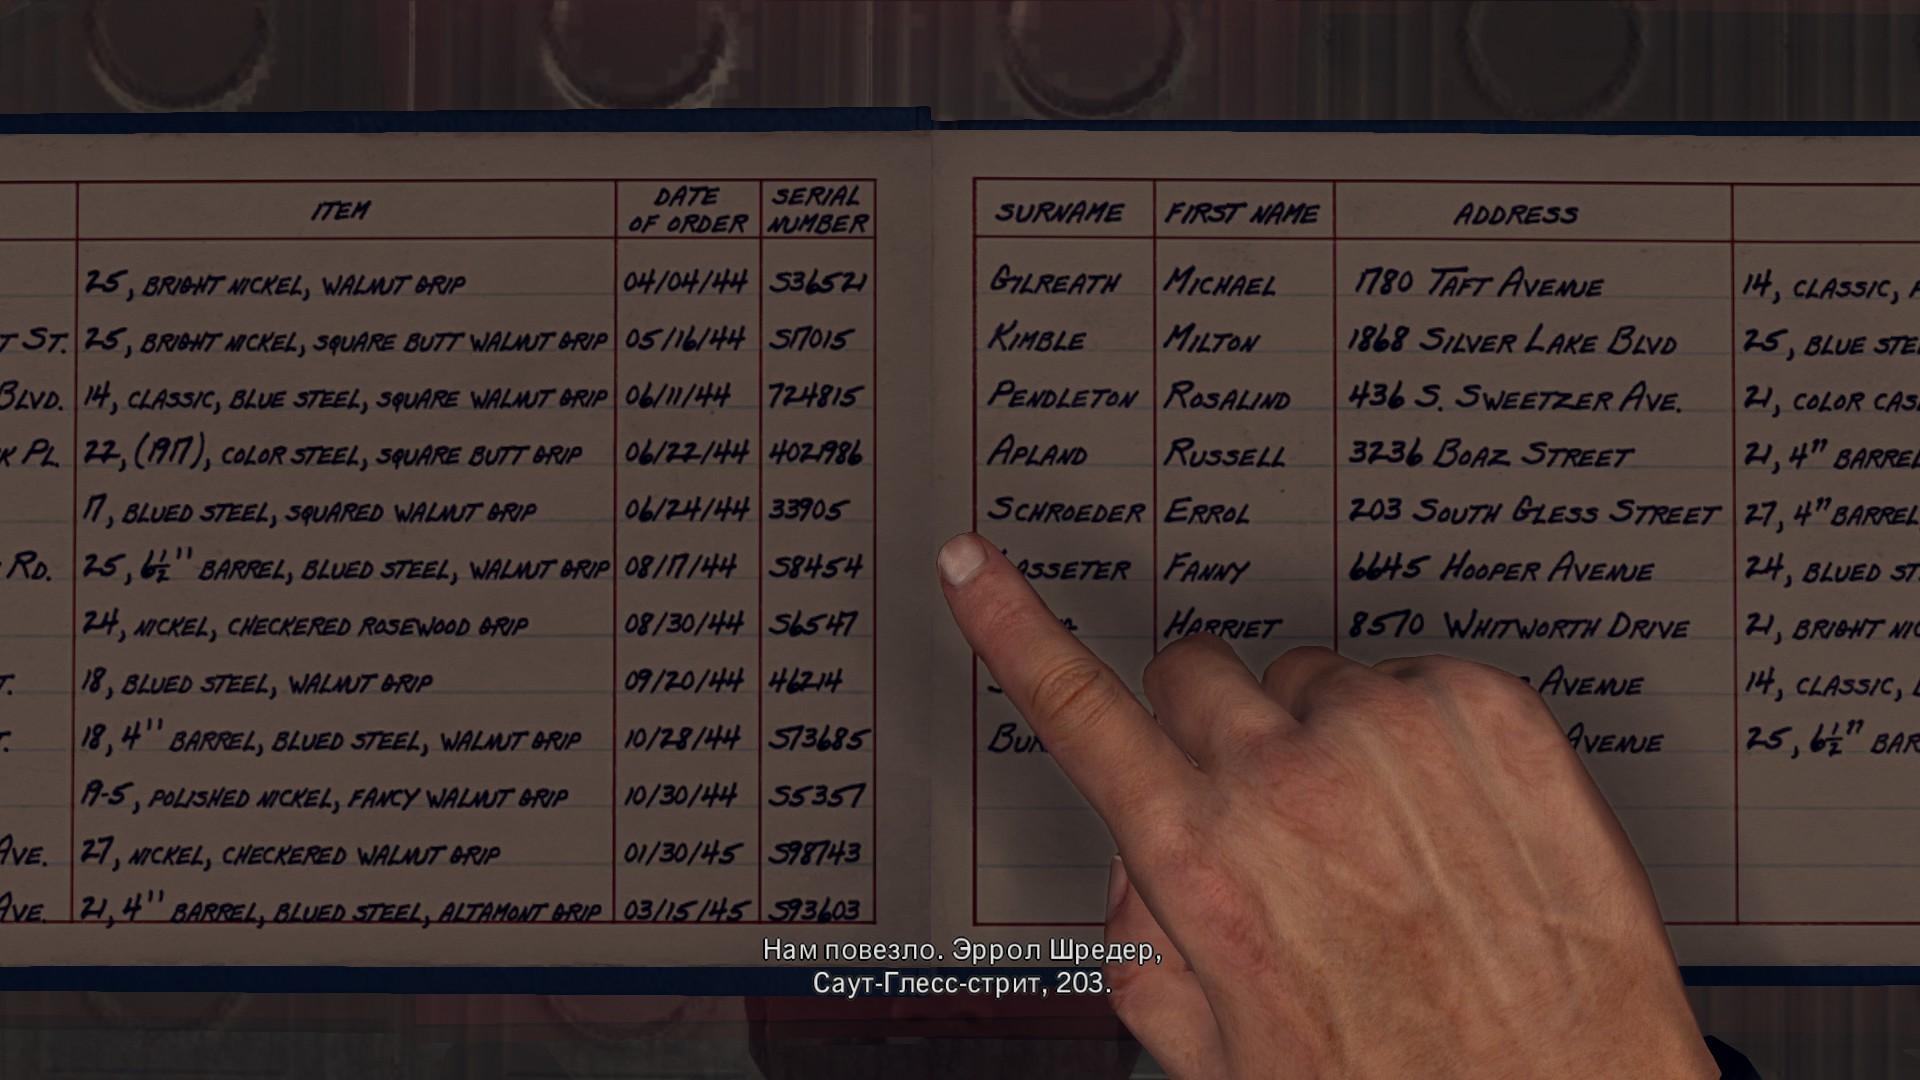 Русификатор L.A. Noire (2011) (Текст) торрент. Скачали 4. Как качать